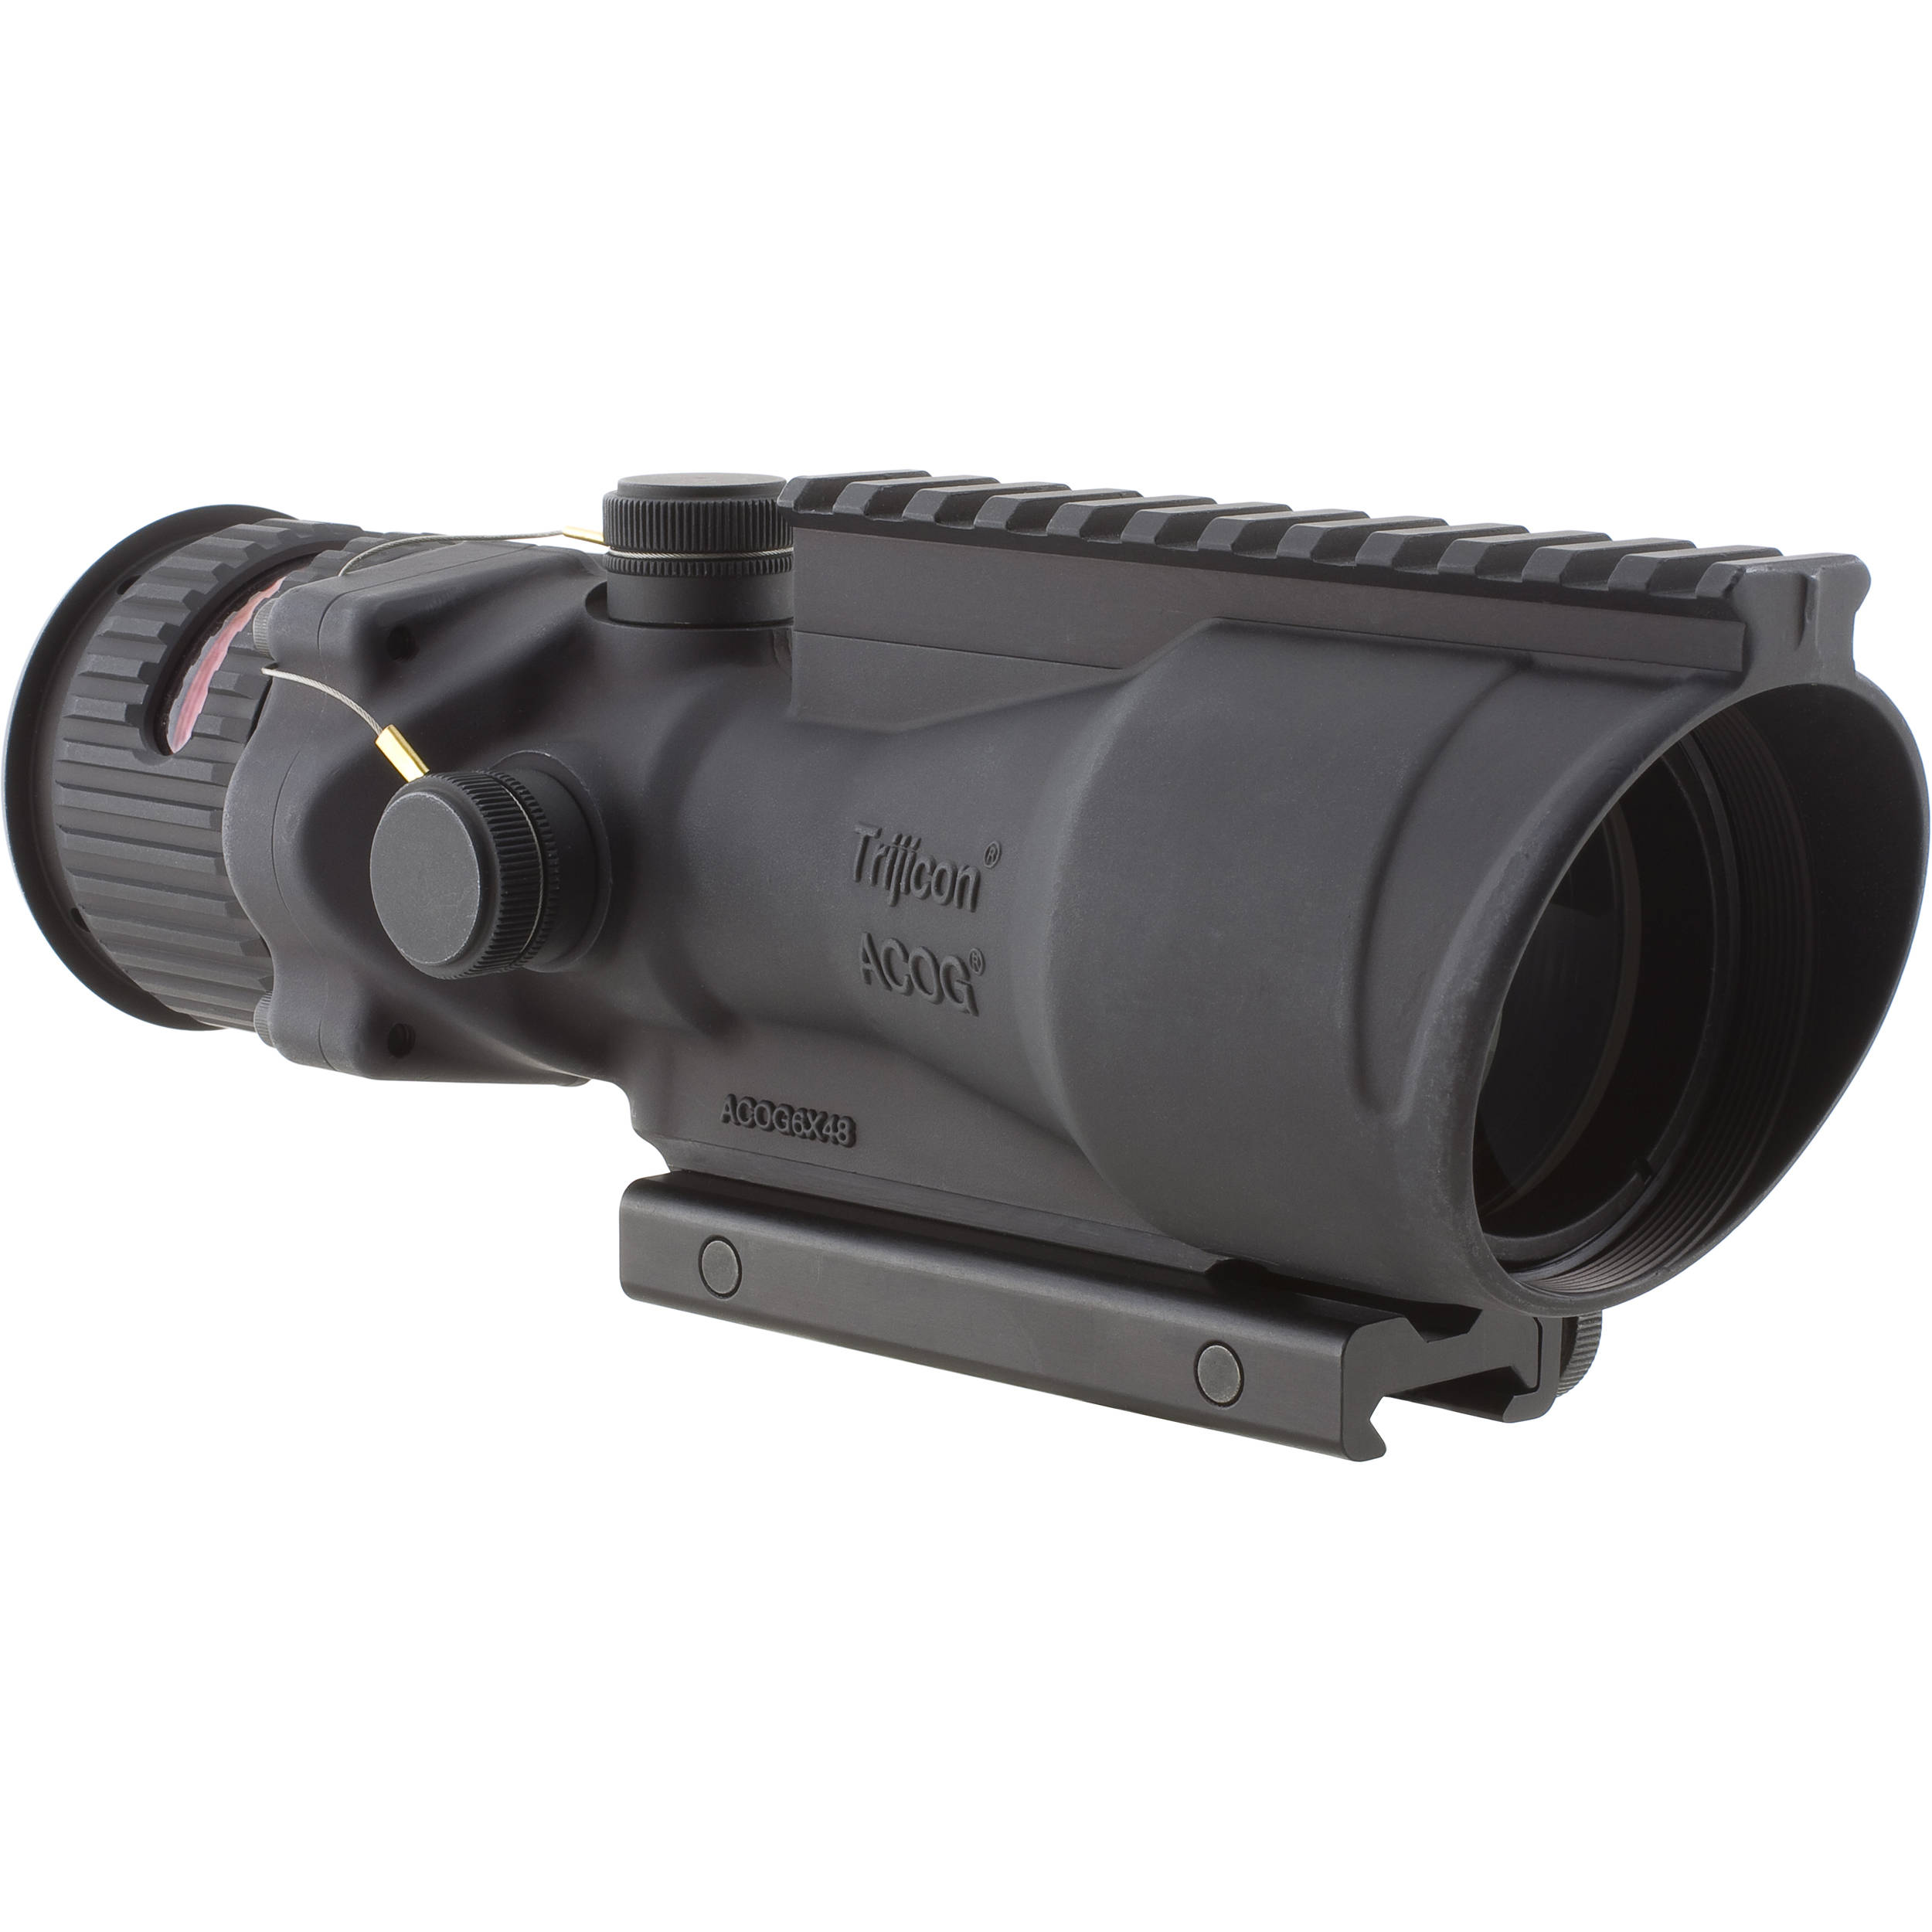 Acog AR15COM : TrijiconTA648308H6x48ACOGRiflescope637814 from www.ar15.com size 2500 x 2500 jpeg 212kB